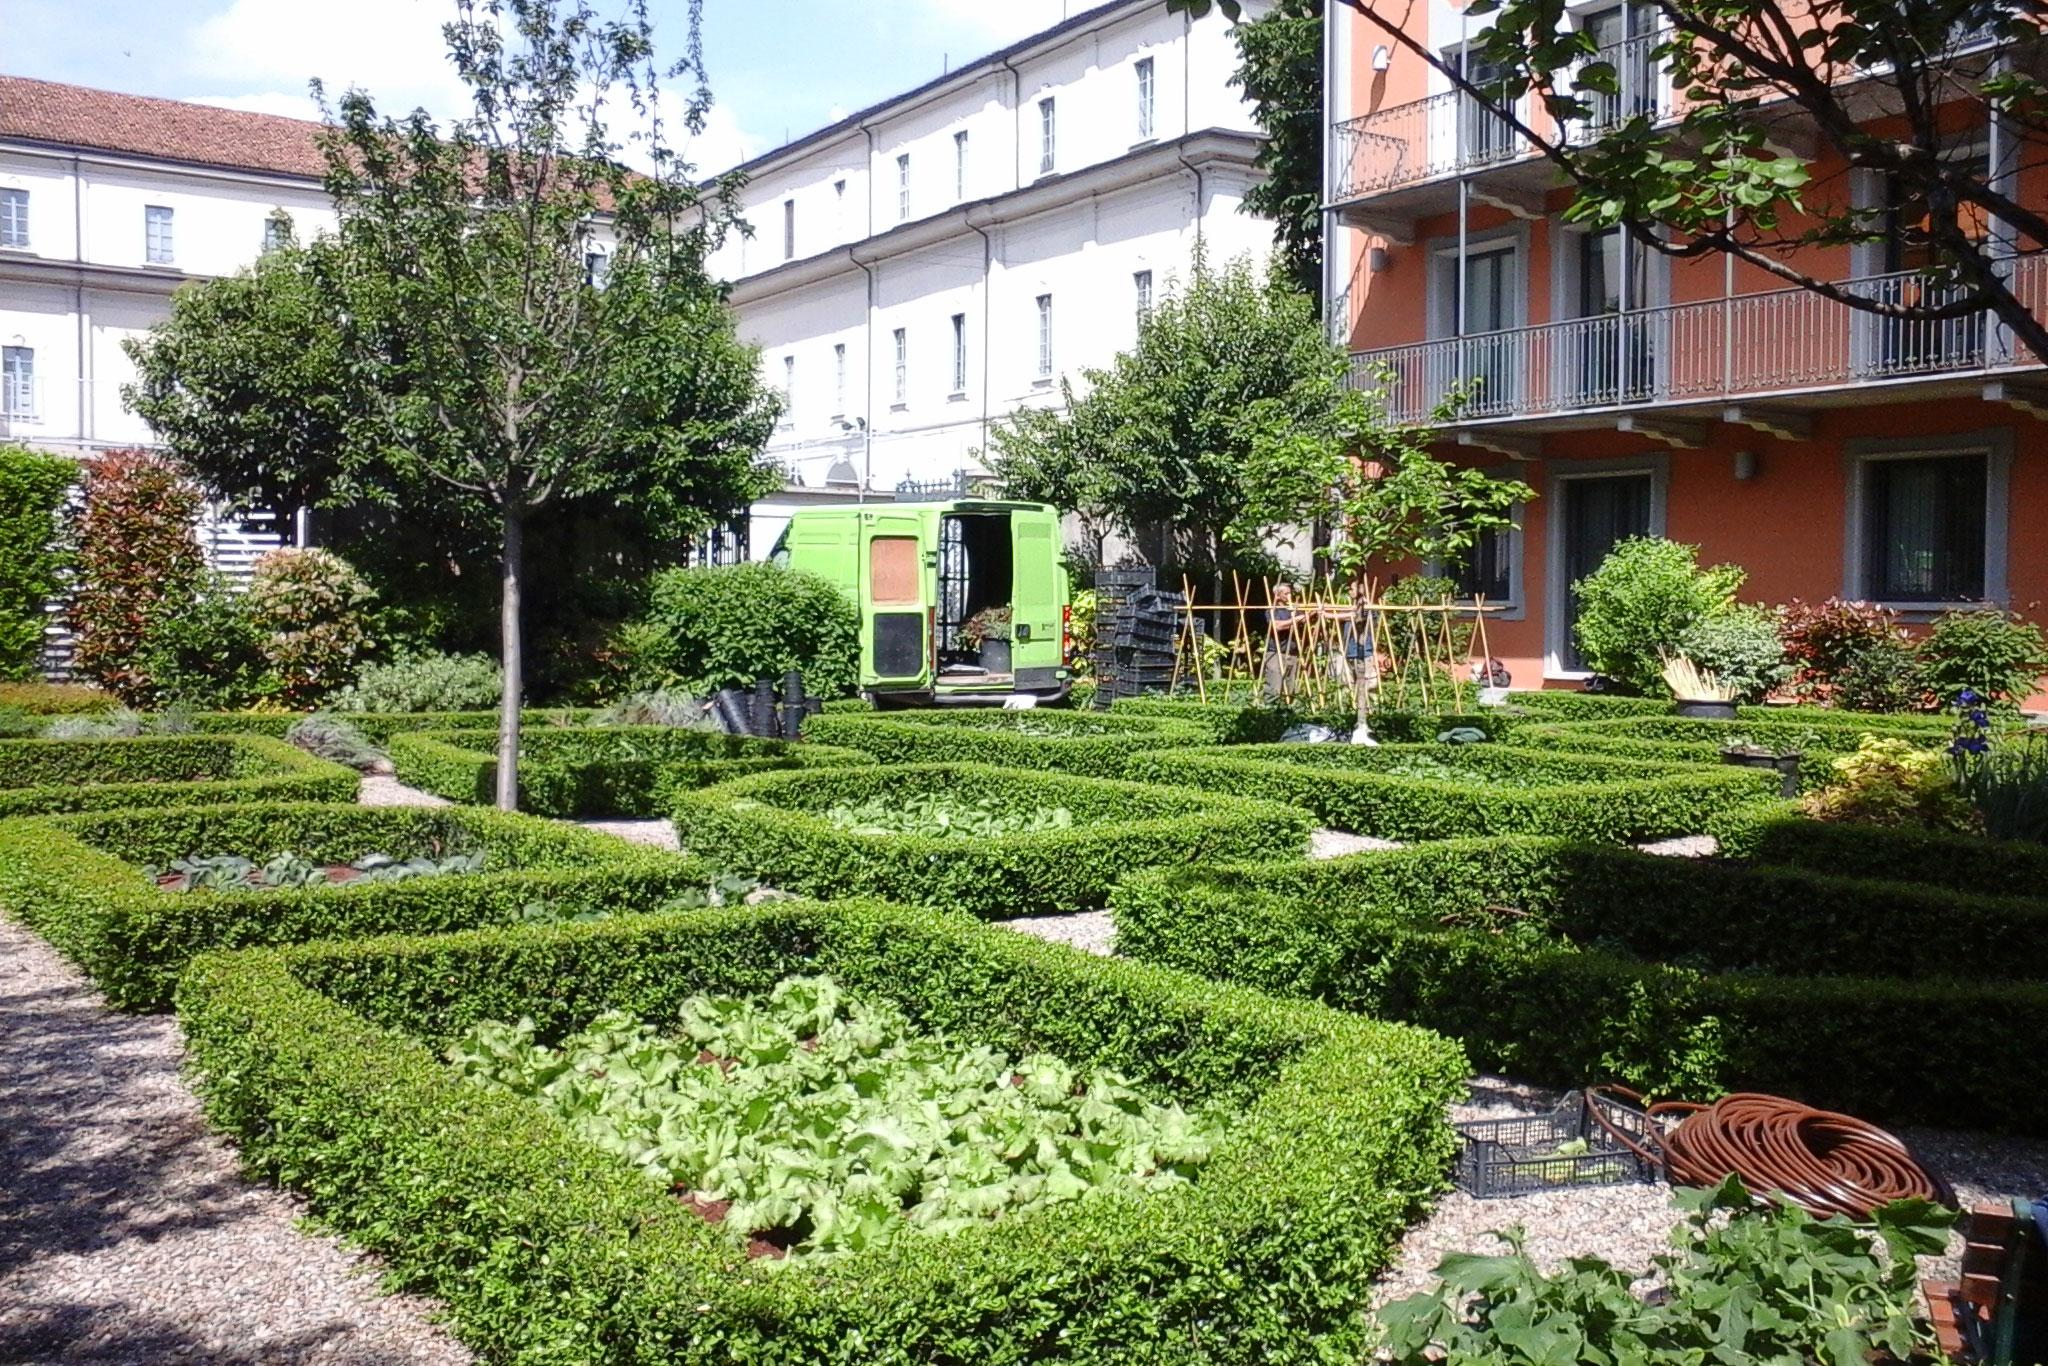 Archiverde-portfolio-giardini-14-def